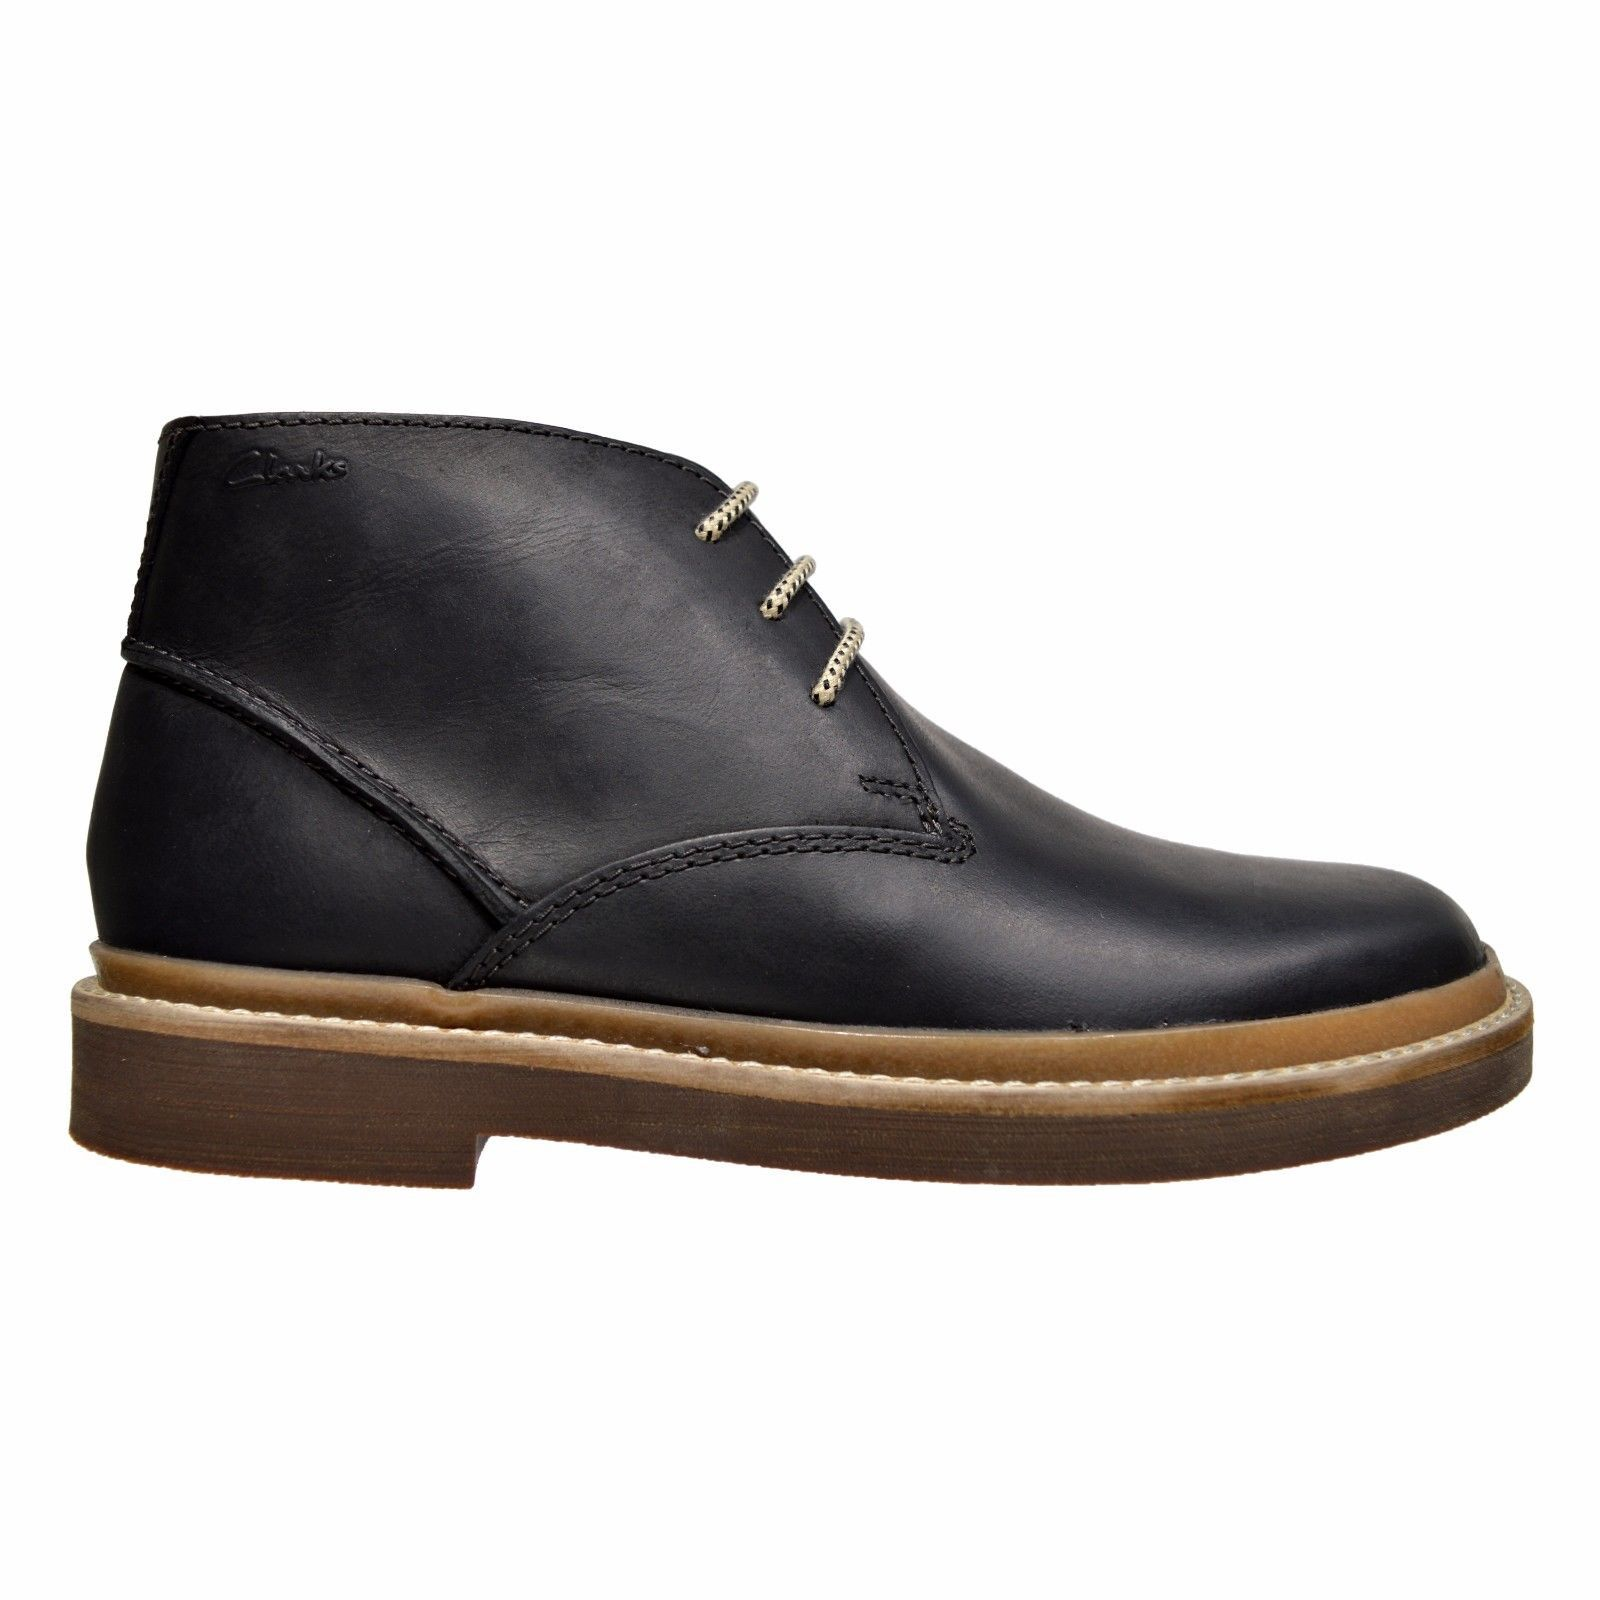 Clarks Bushacre Ridge Men's Casual Leather Chukka Boot Shoes